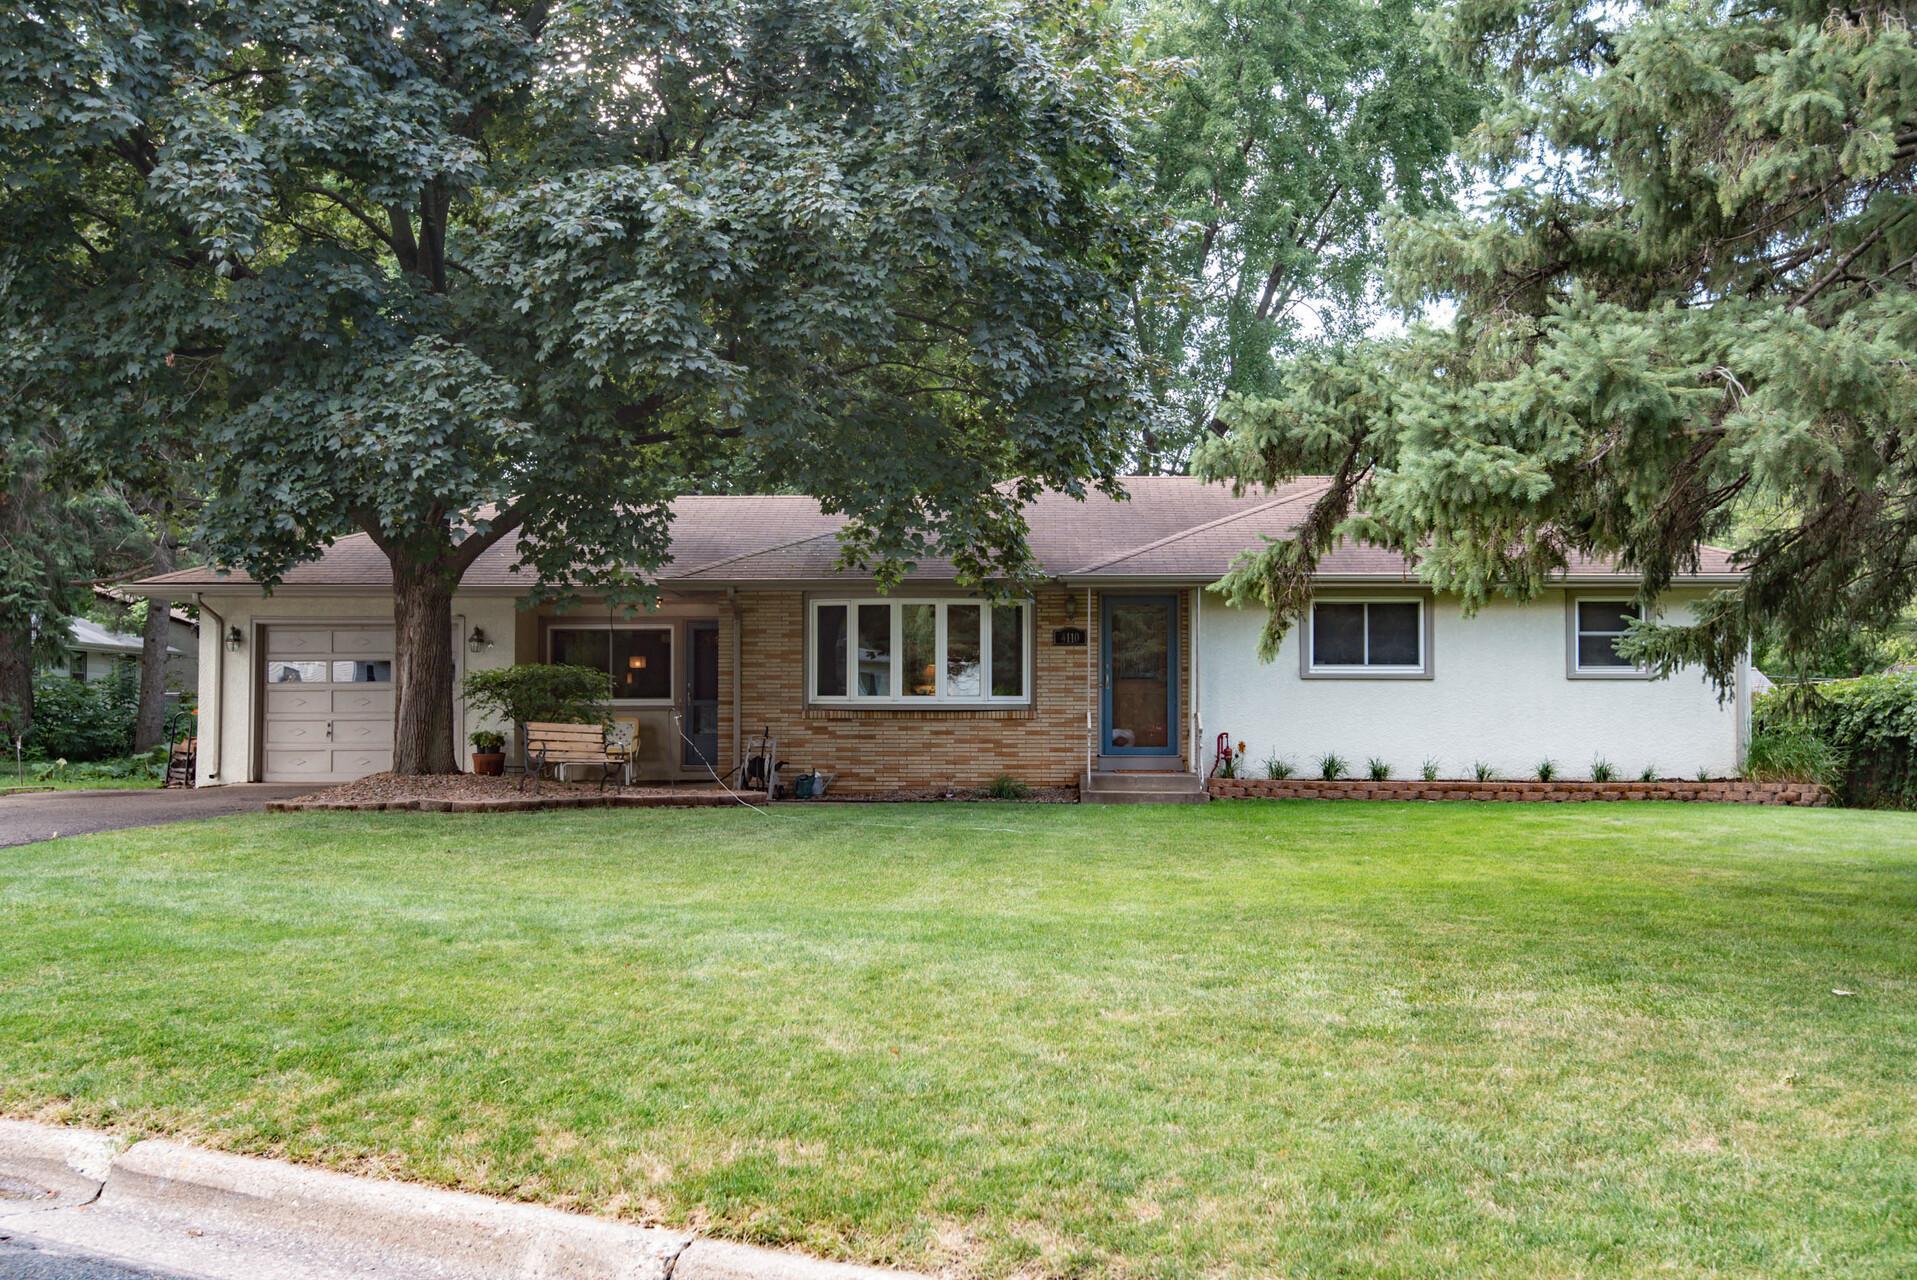 4110 Polk NE Property Photo - Columbia Heights, MN real estate listing